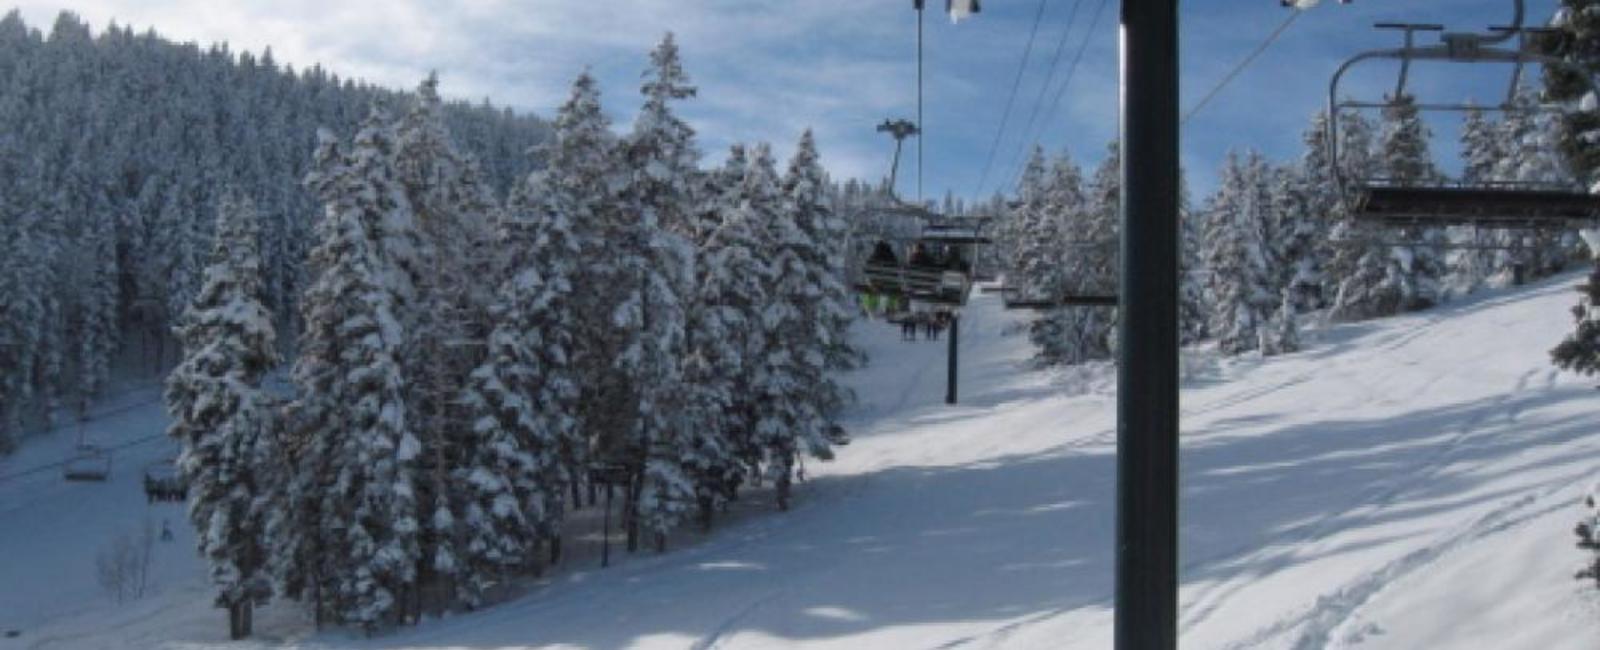 Subaru US Freeskiing Nationals Returns to Snowbird March 10-15